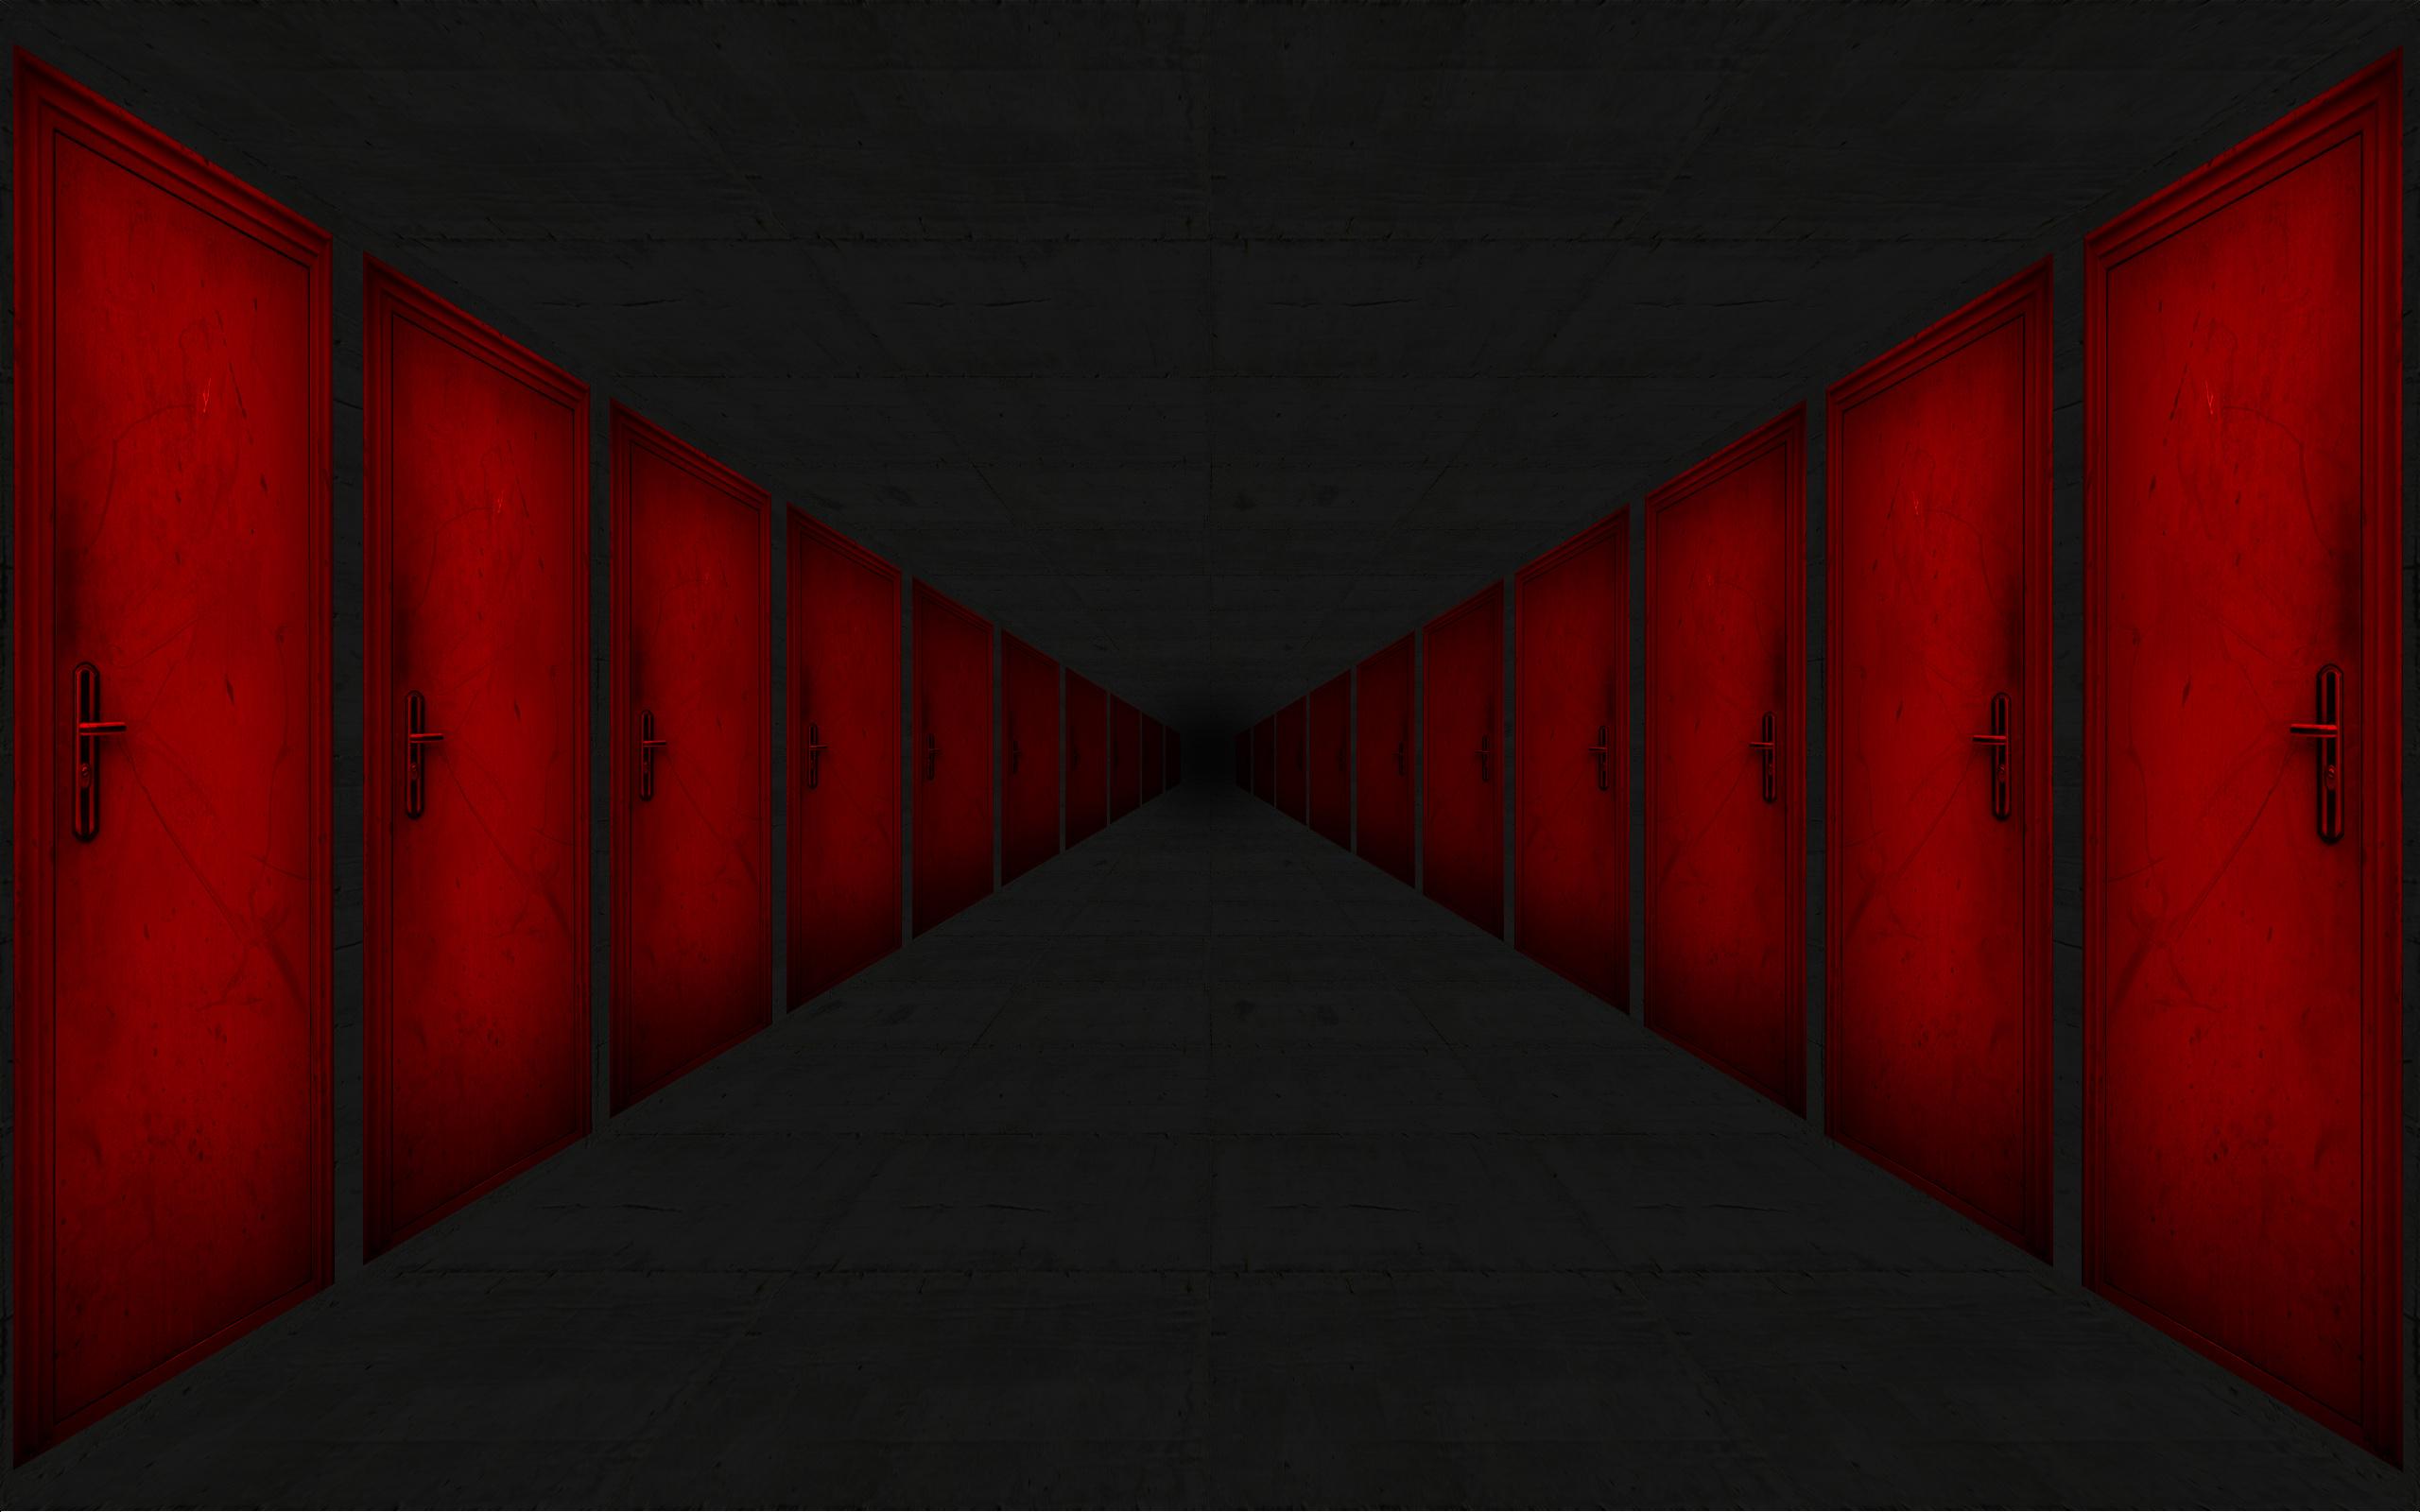 Iphone Wallpaper Black And Red 18 Cool Hd Wallpaper   Hdblackwallpaper 2560x1600